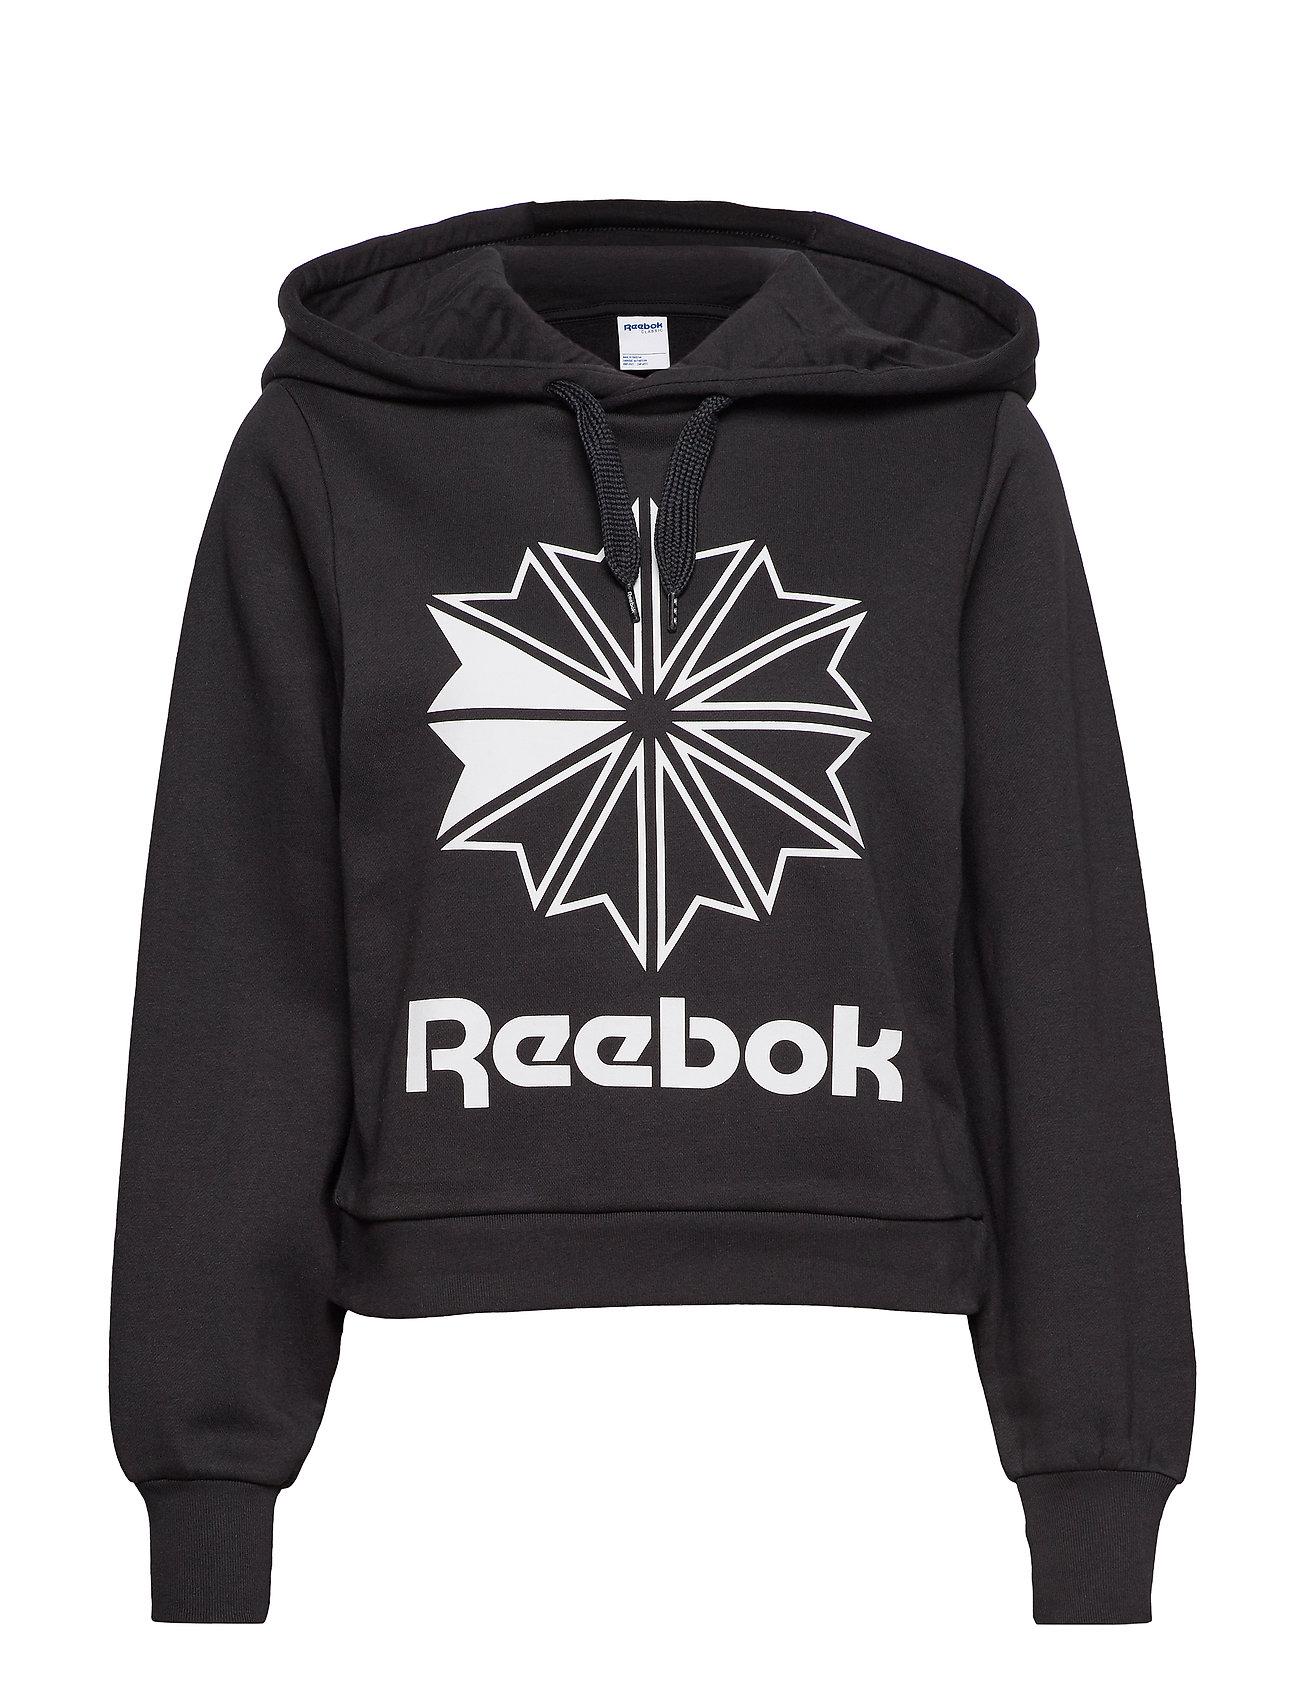 Reebok Classics CL FL BIG LOGO HOODIE - BLACK